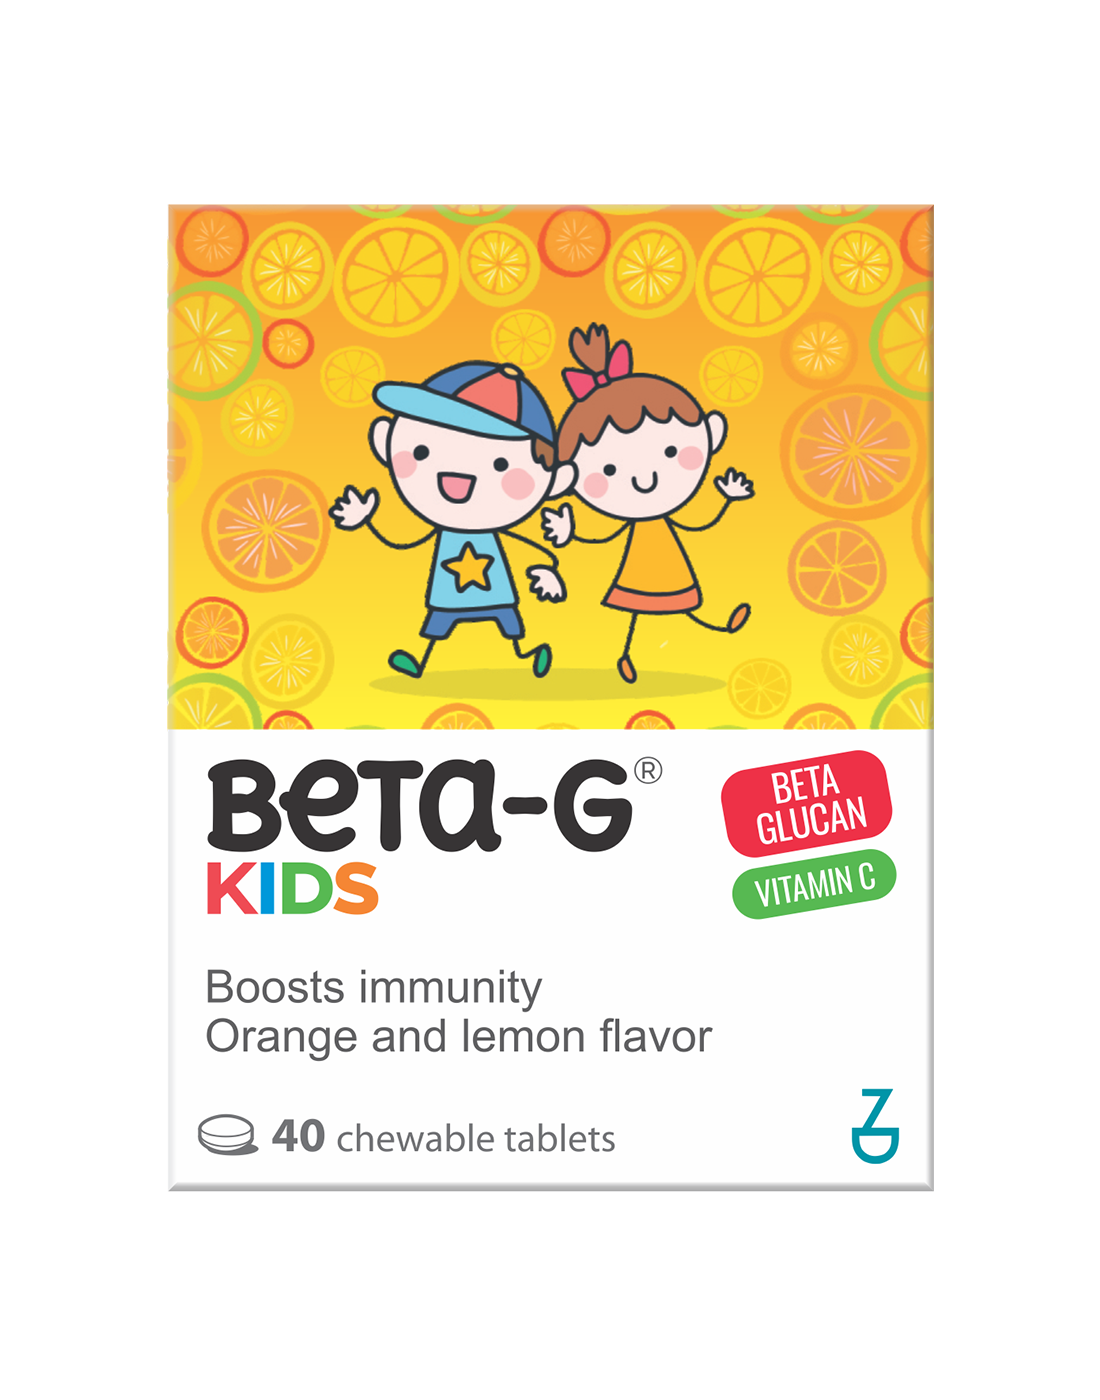 BETA-G kids